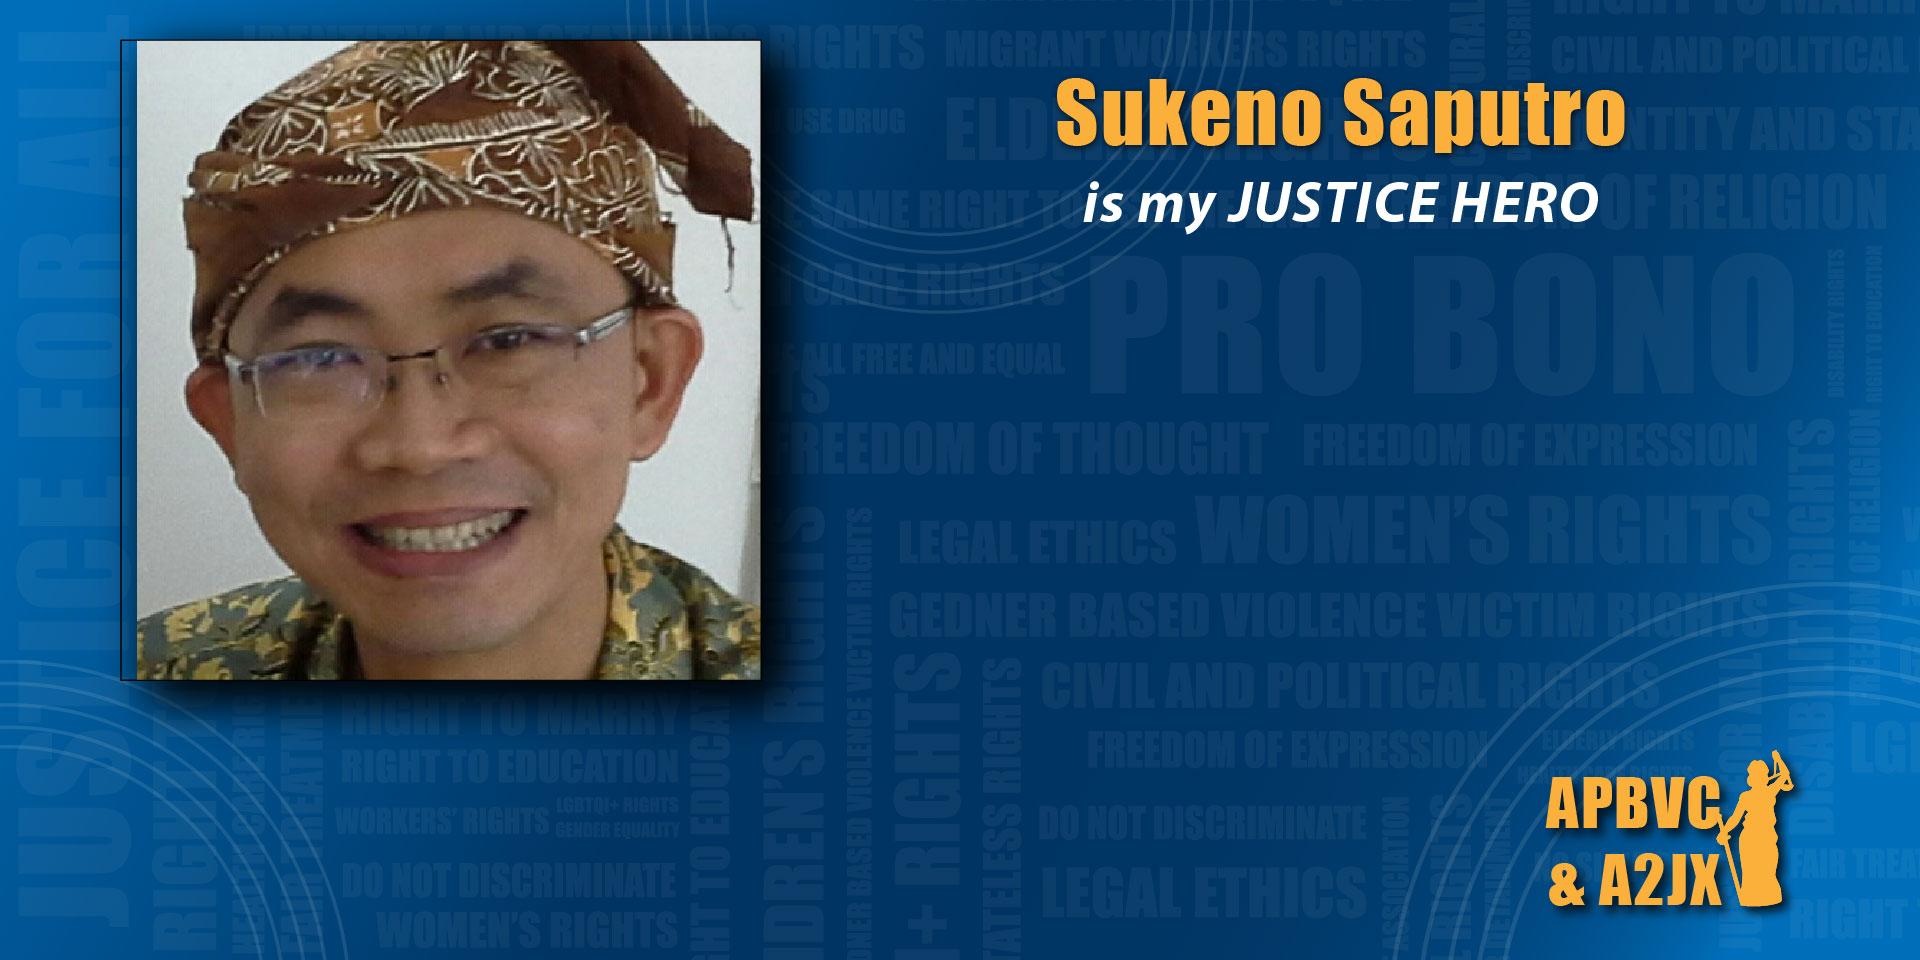 Sukeno Saputro